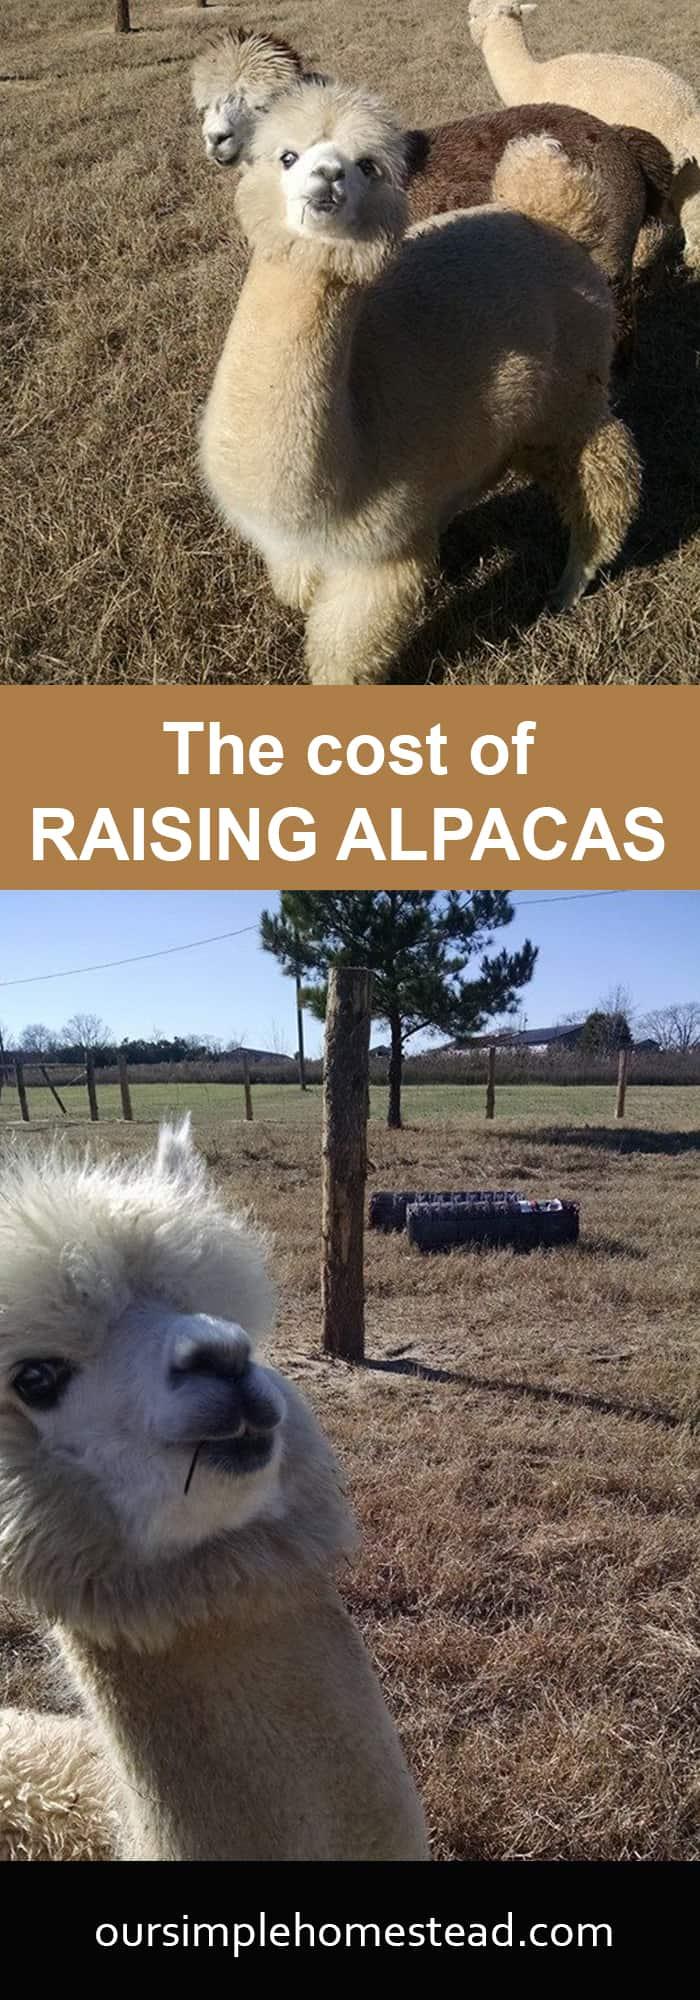 The Cost of Raising Alpacas